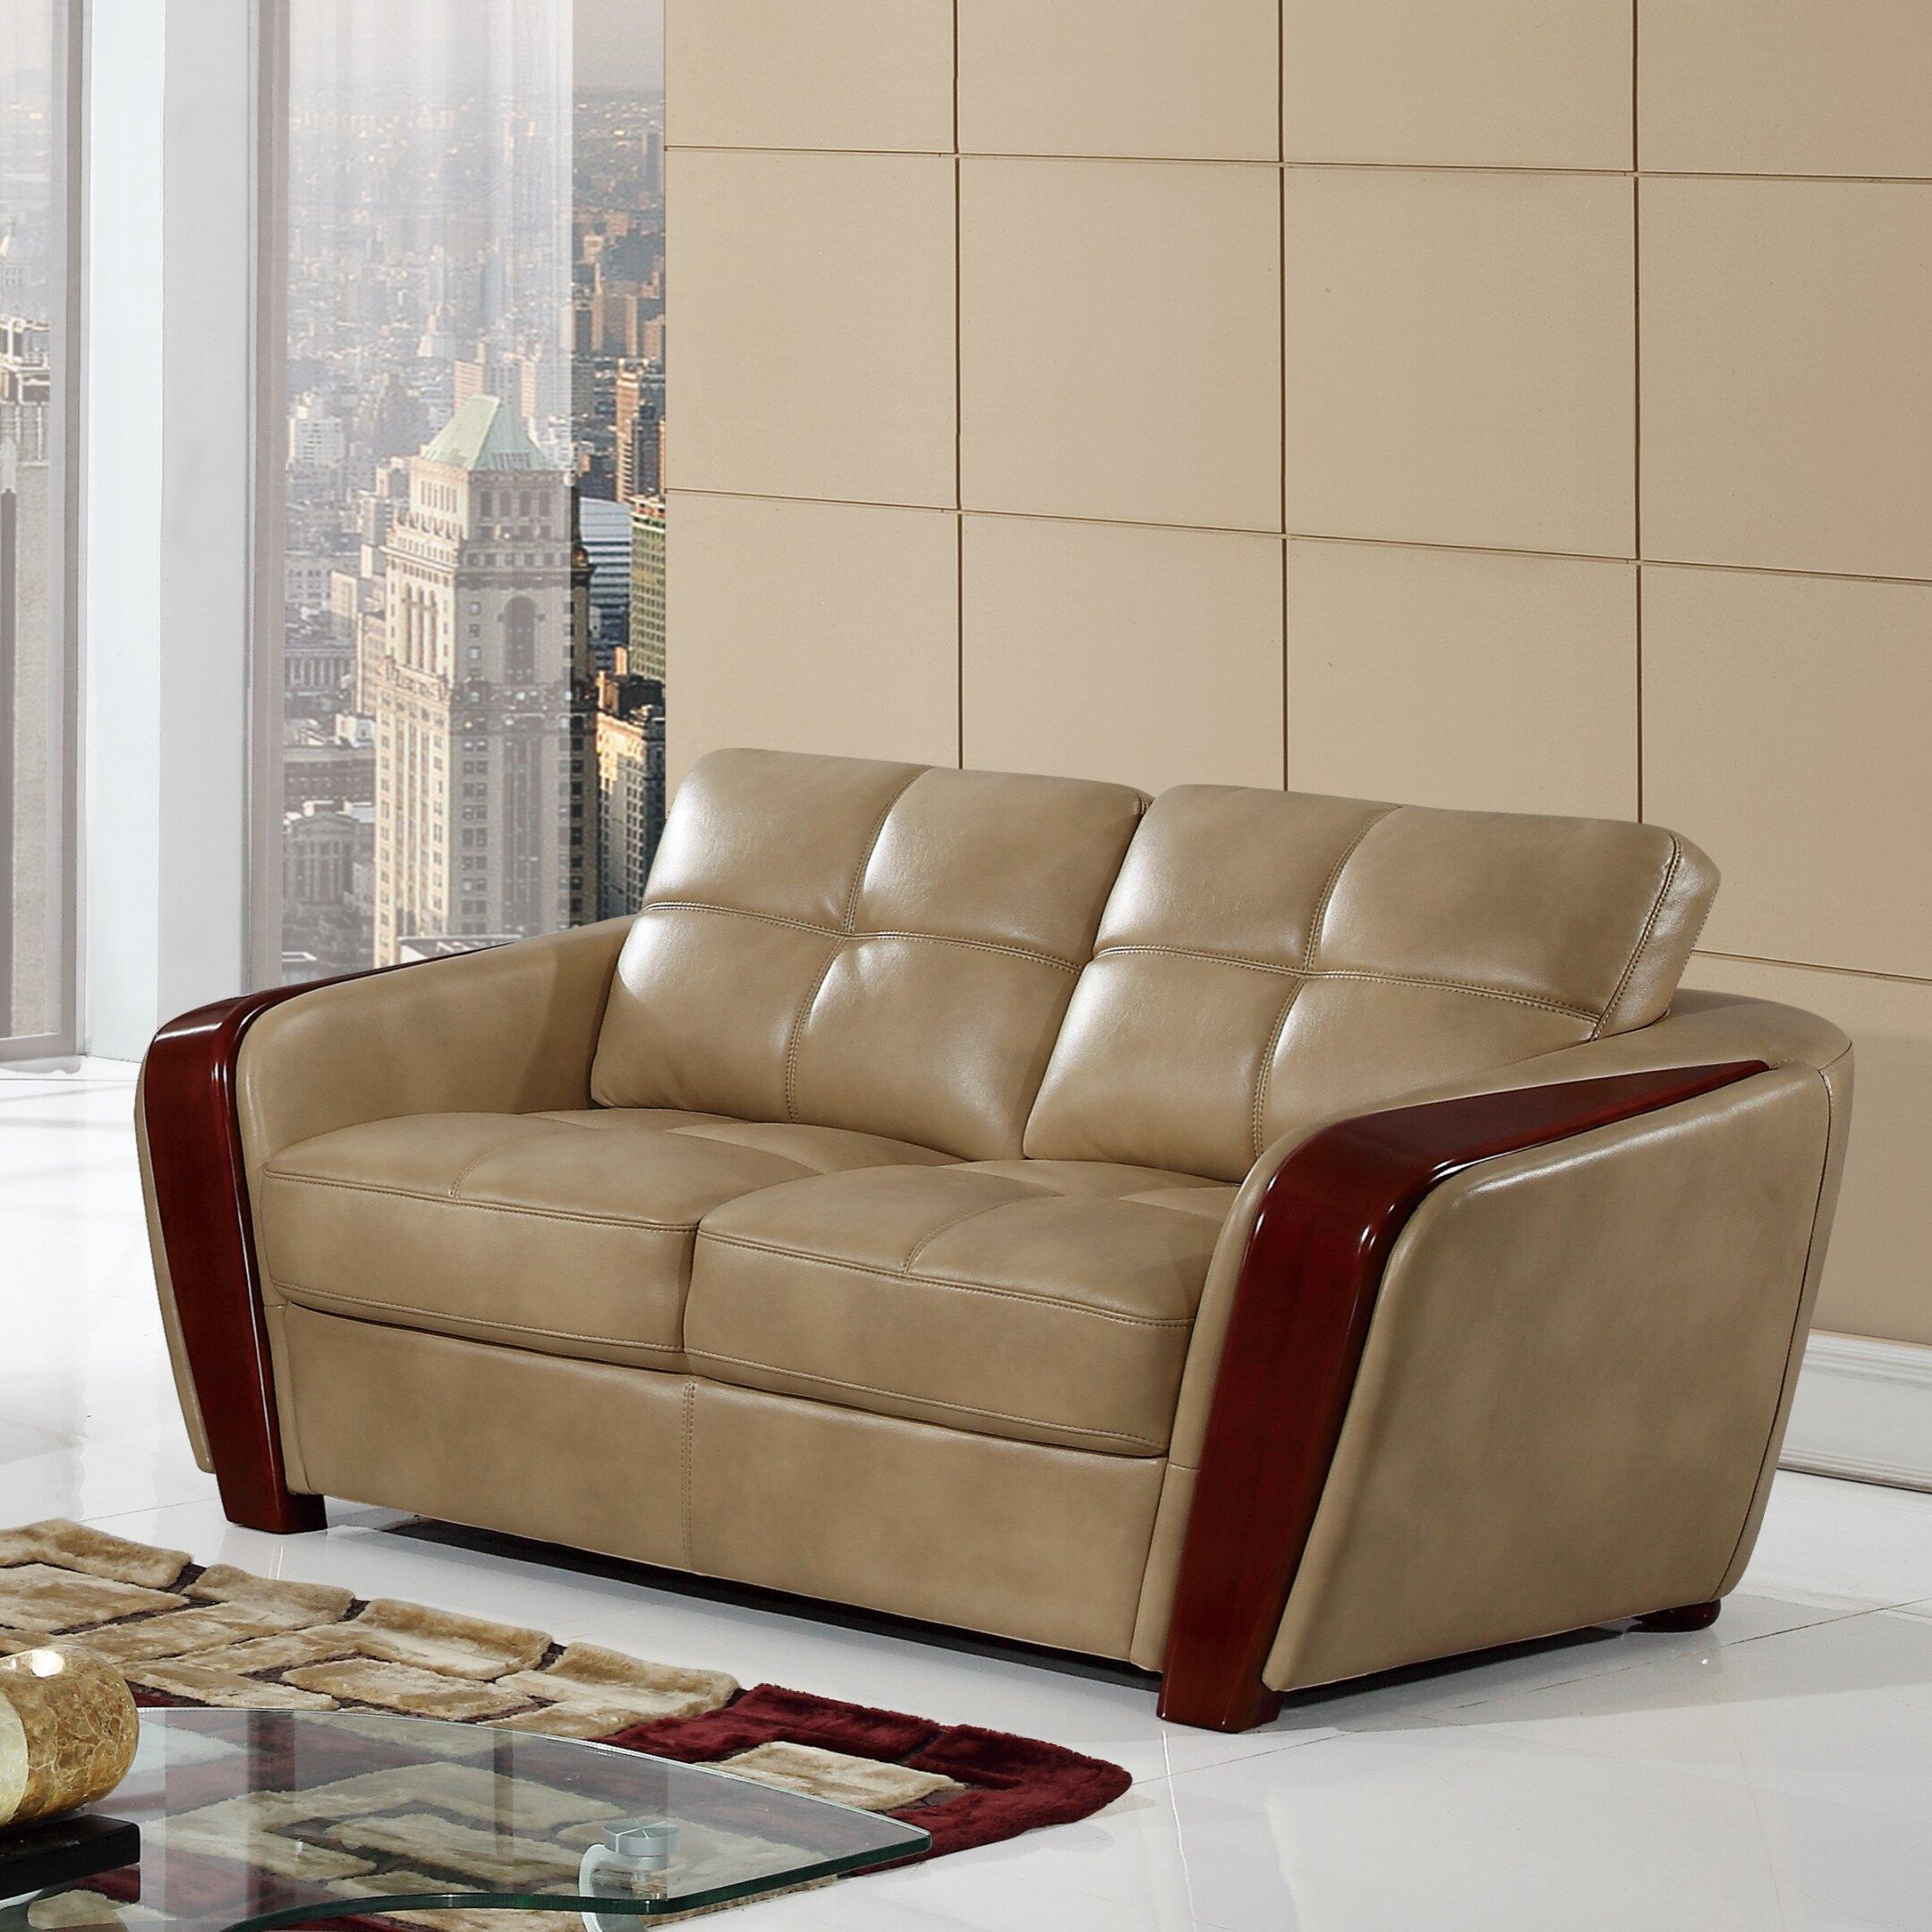 Global Furniture USA Blanche Living Room Collection Wayfair